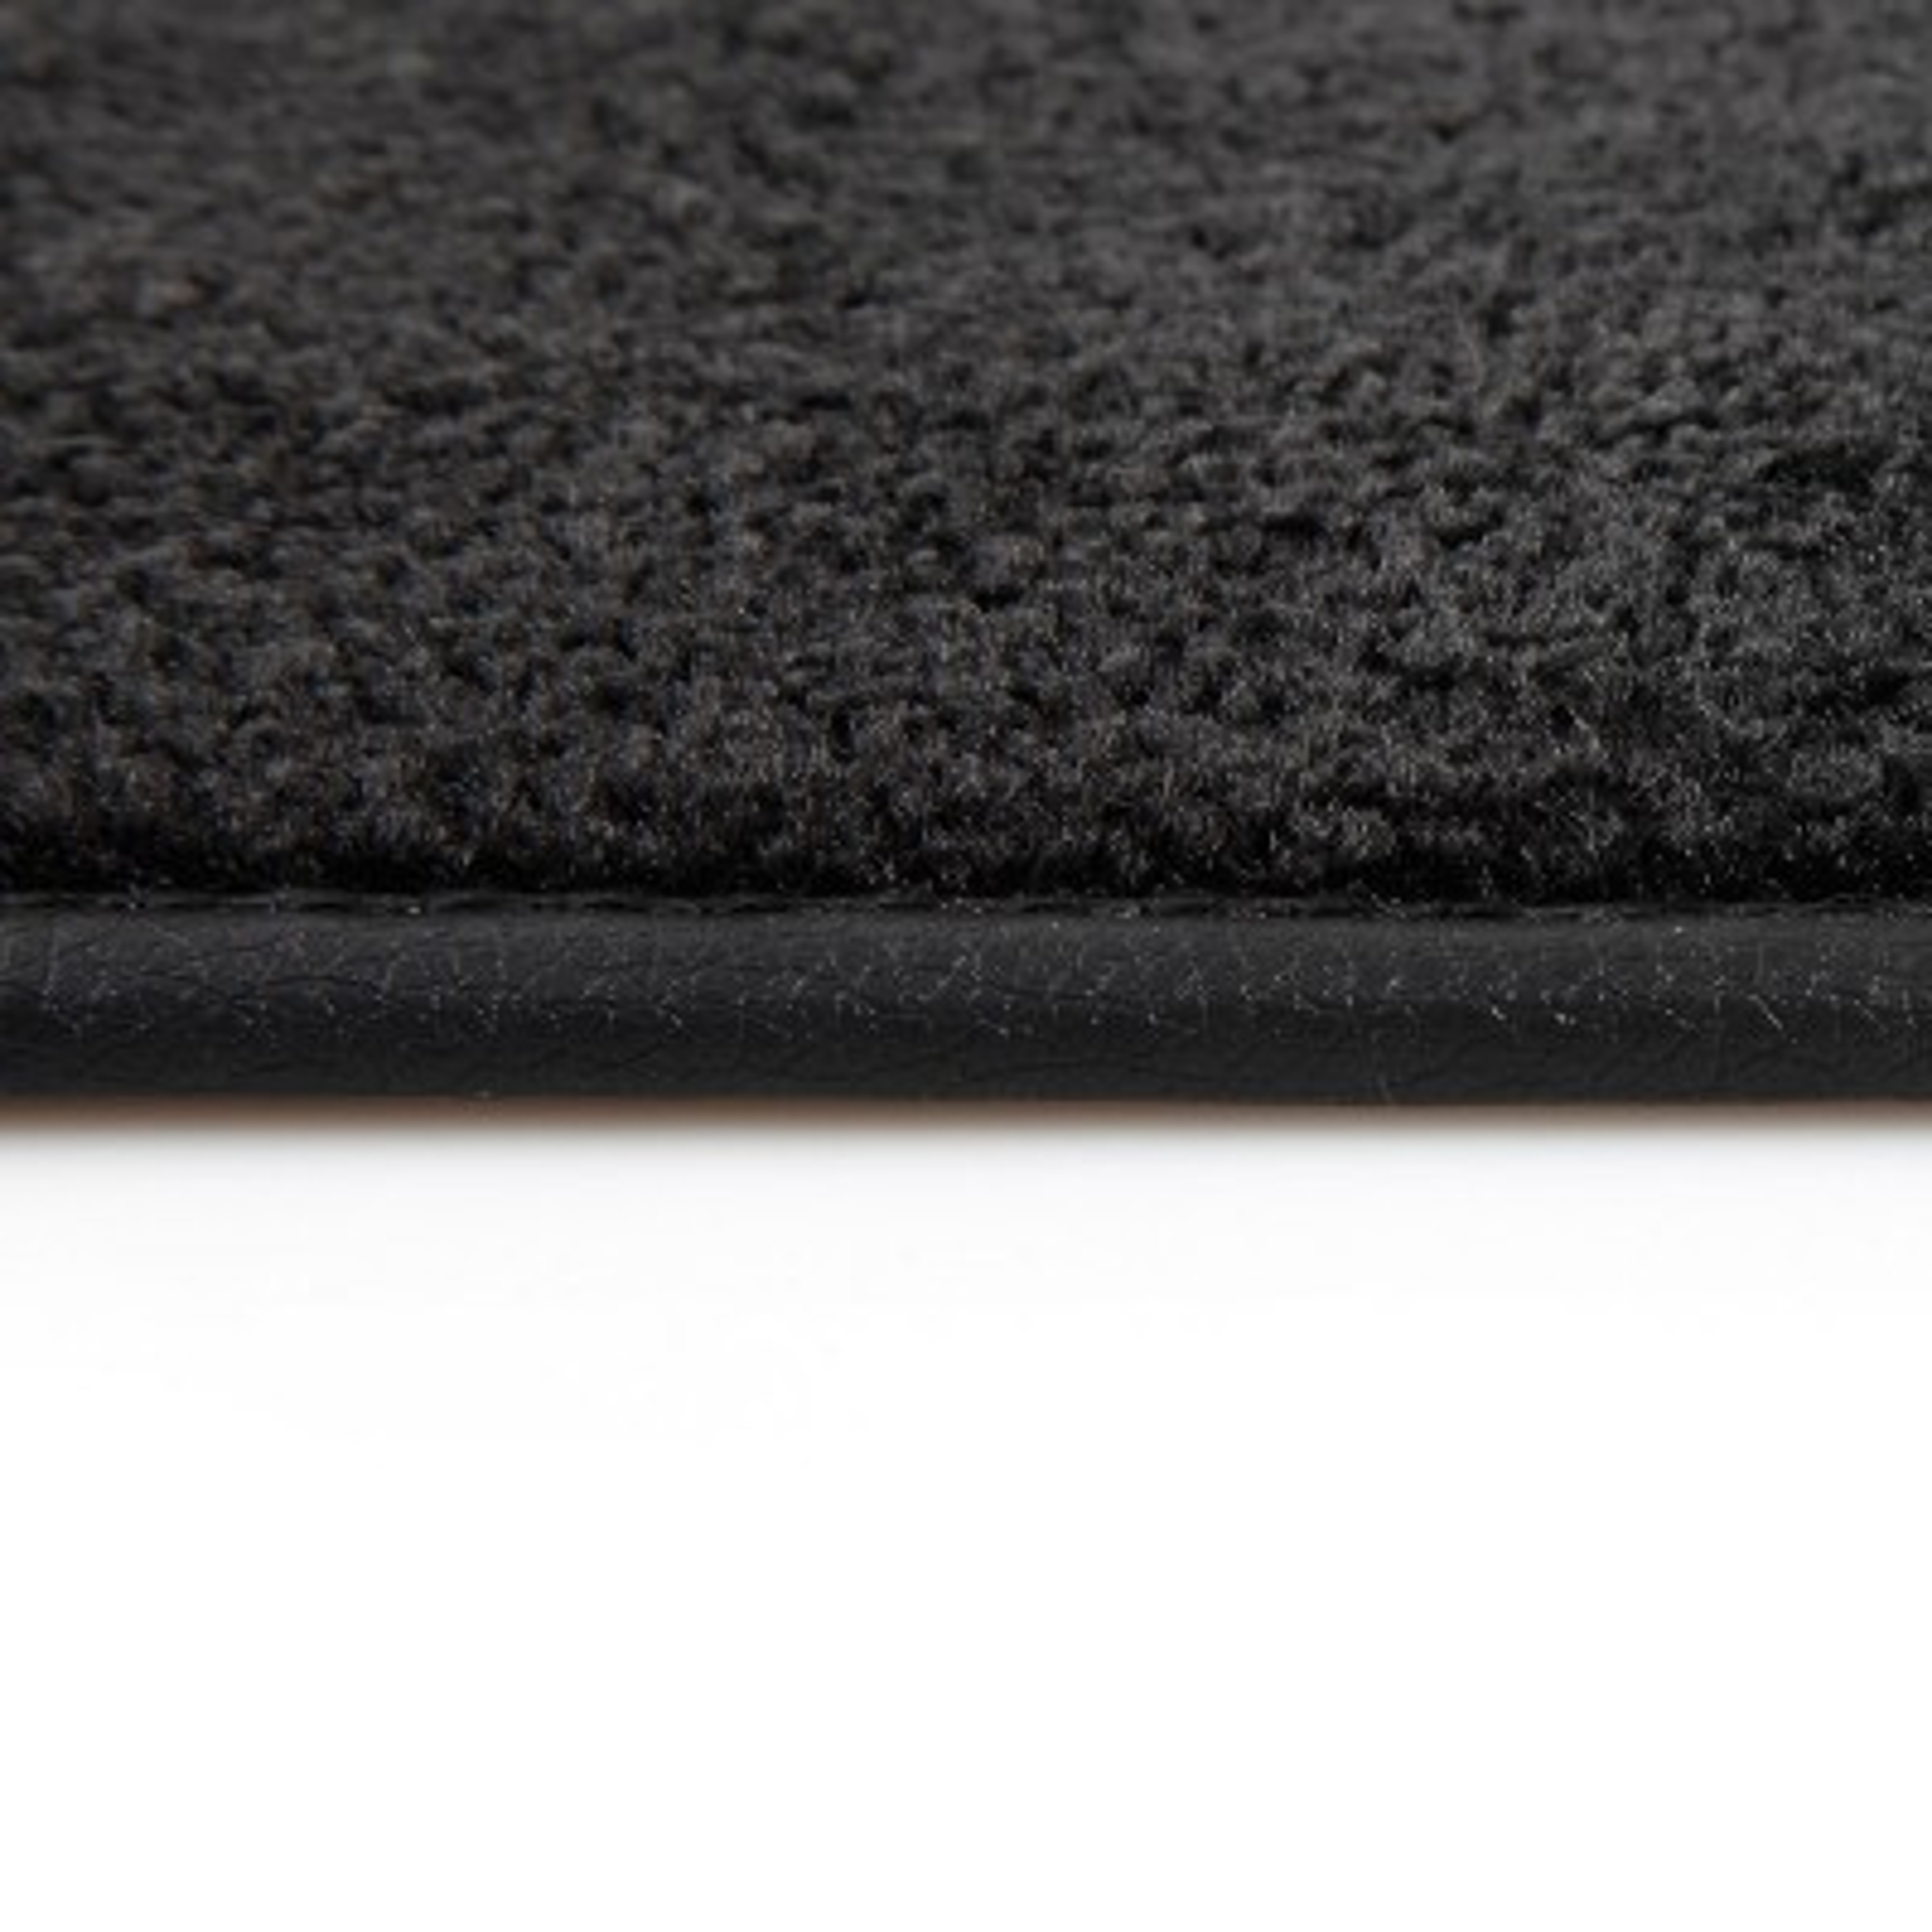 Plush Embroidered Floor Mats Carpet Kits Amp Floor Mats